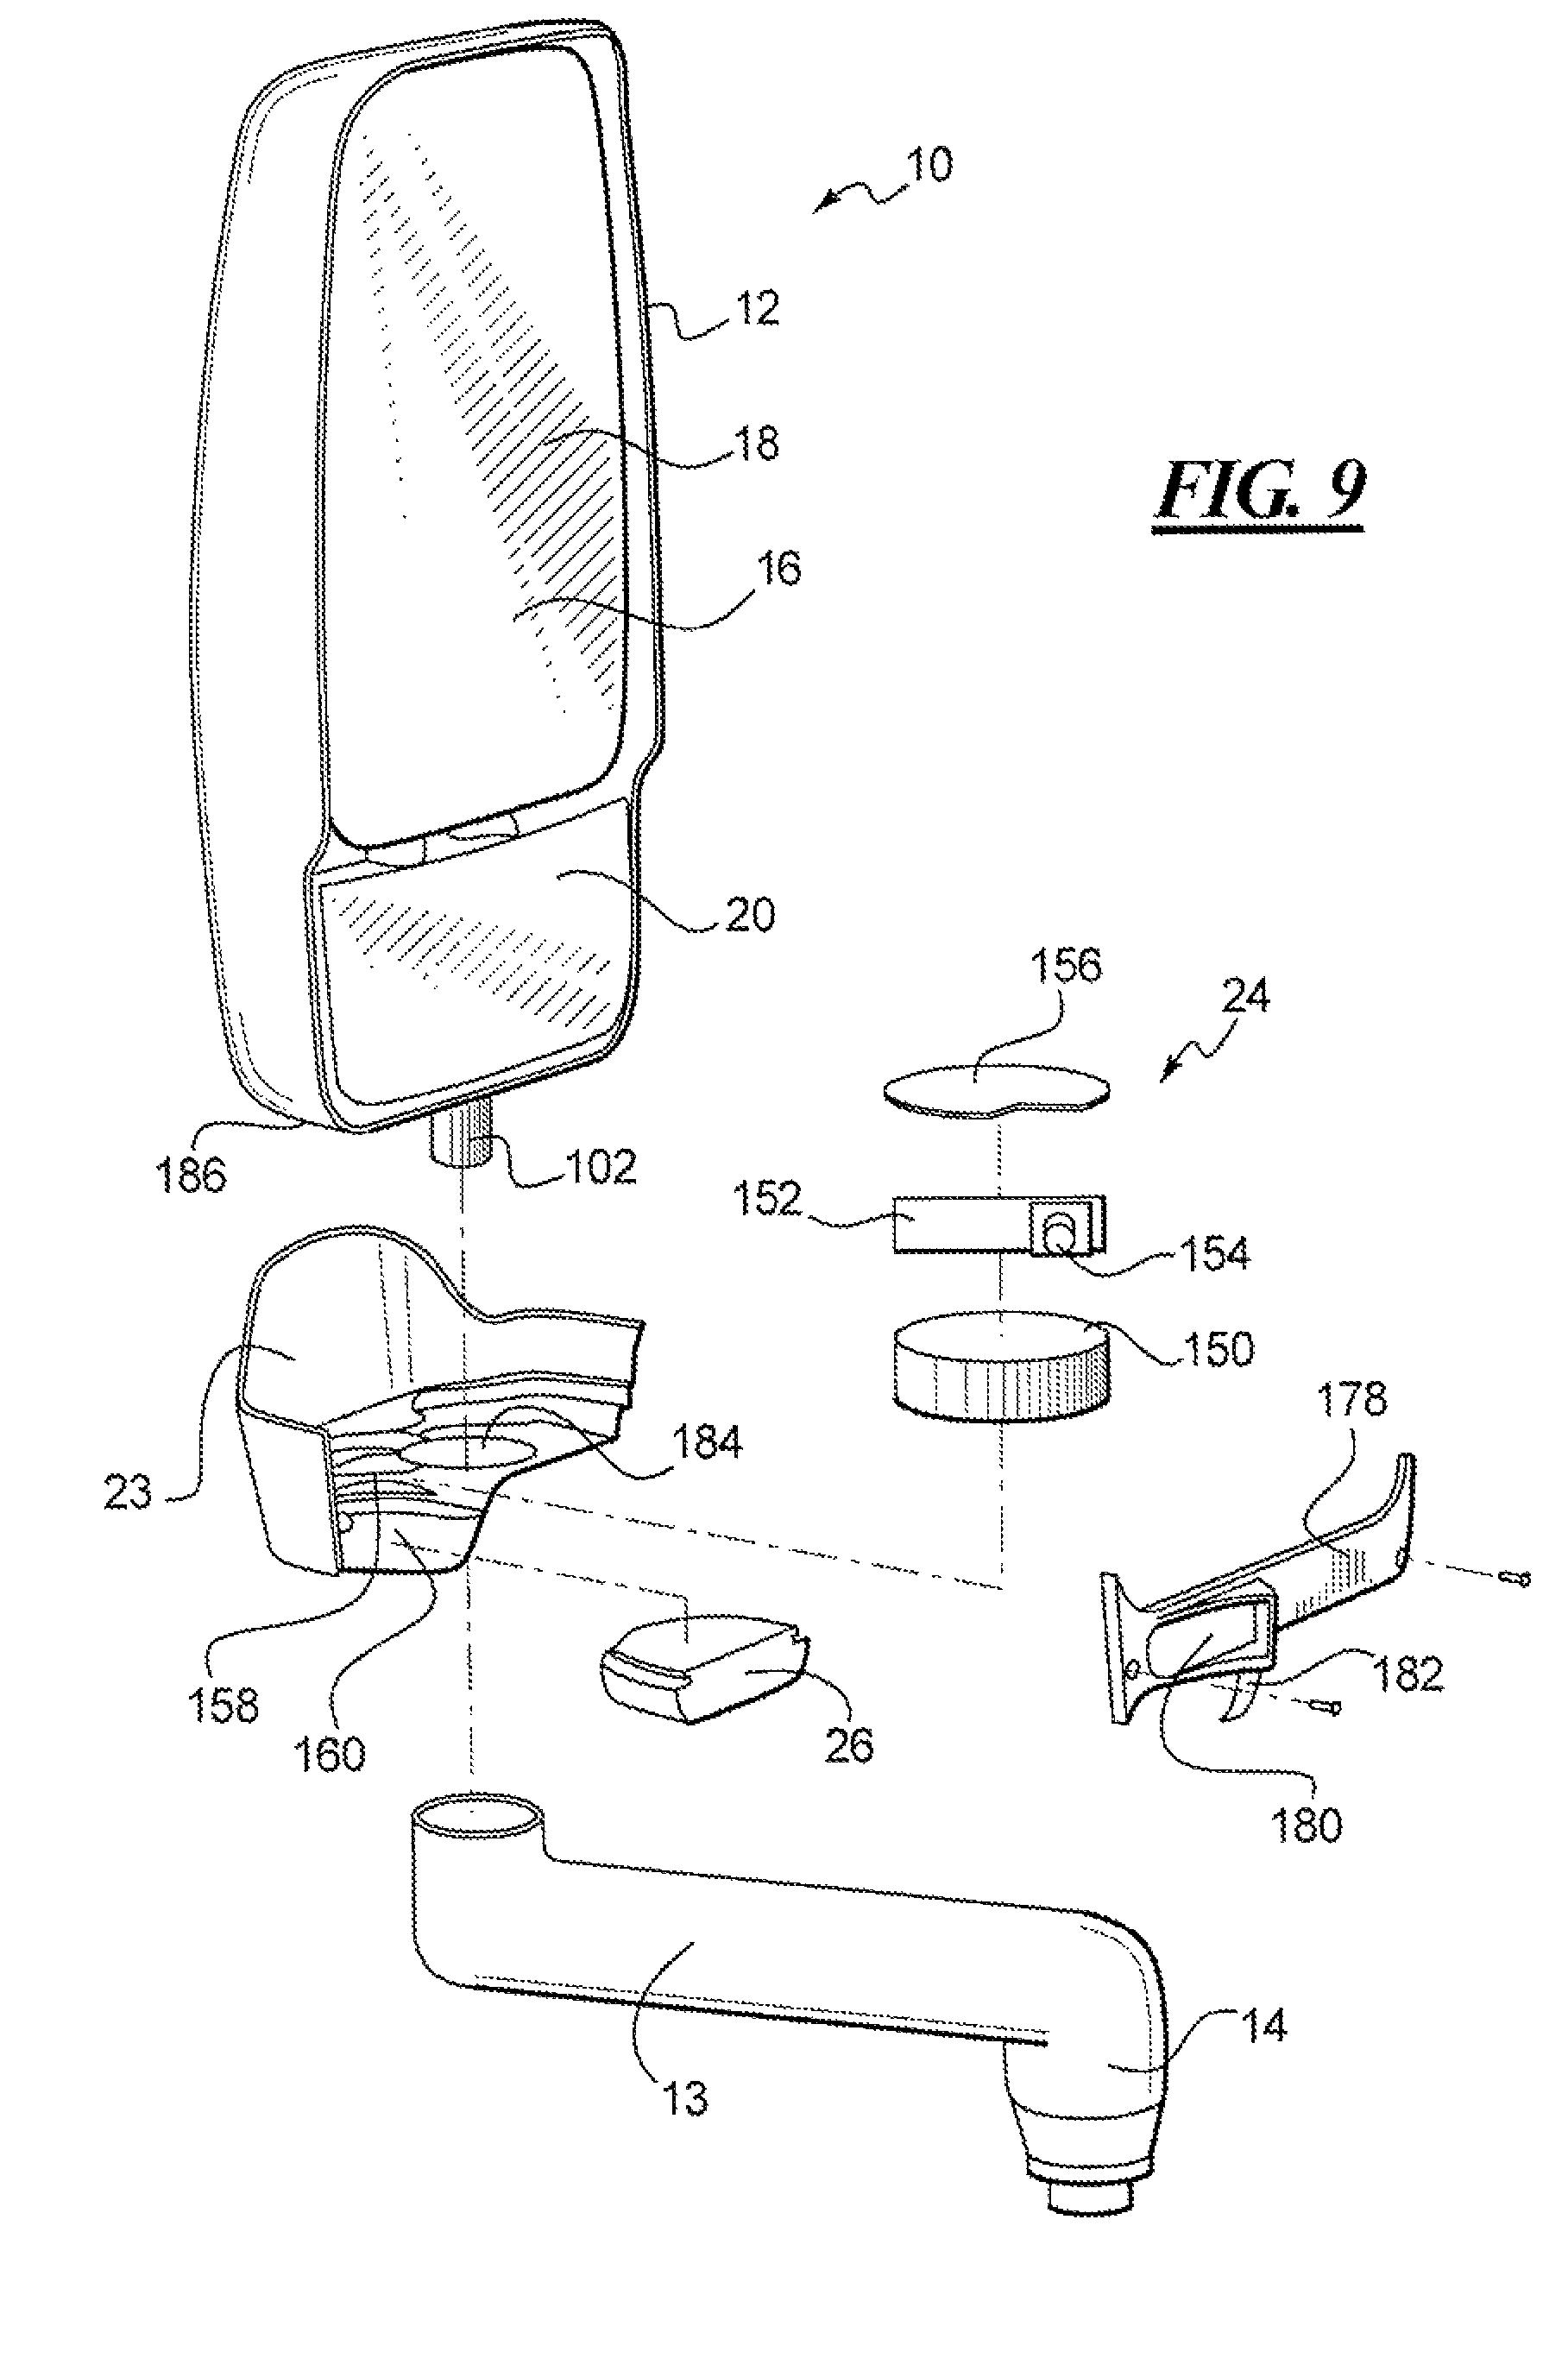 velvac mirror with camera wiring diagram